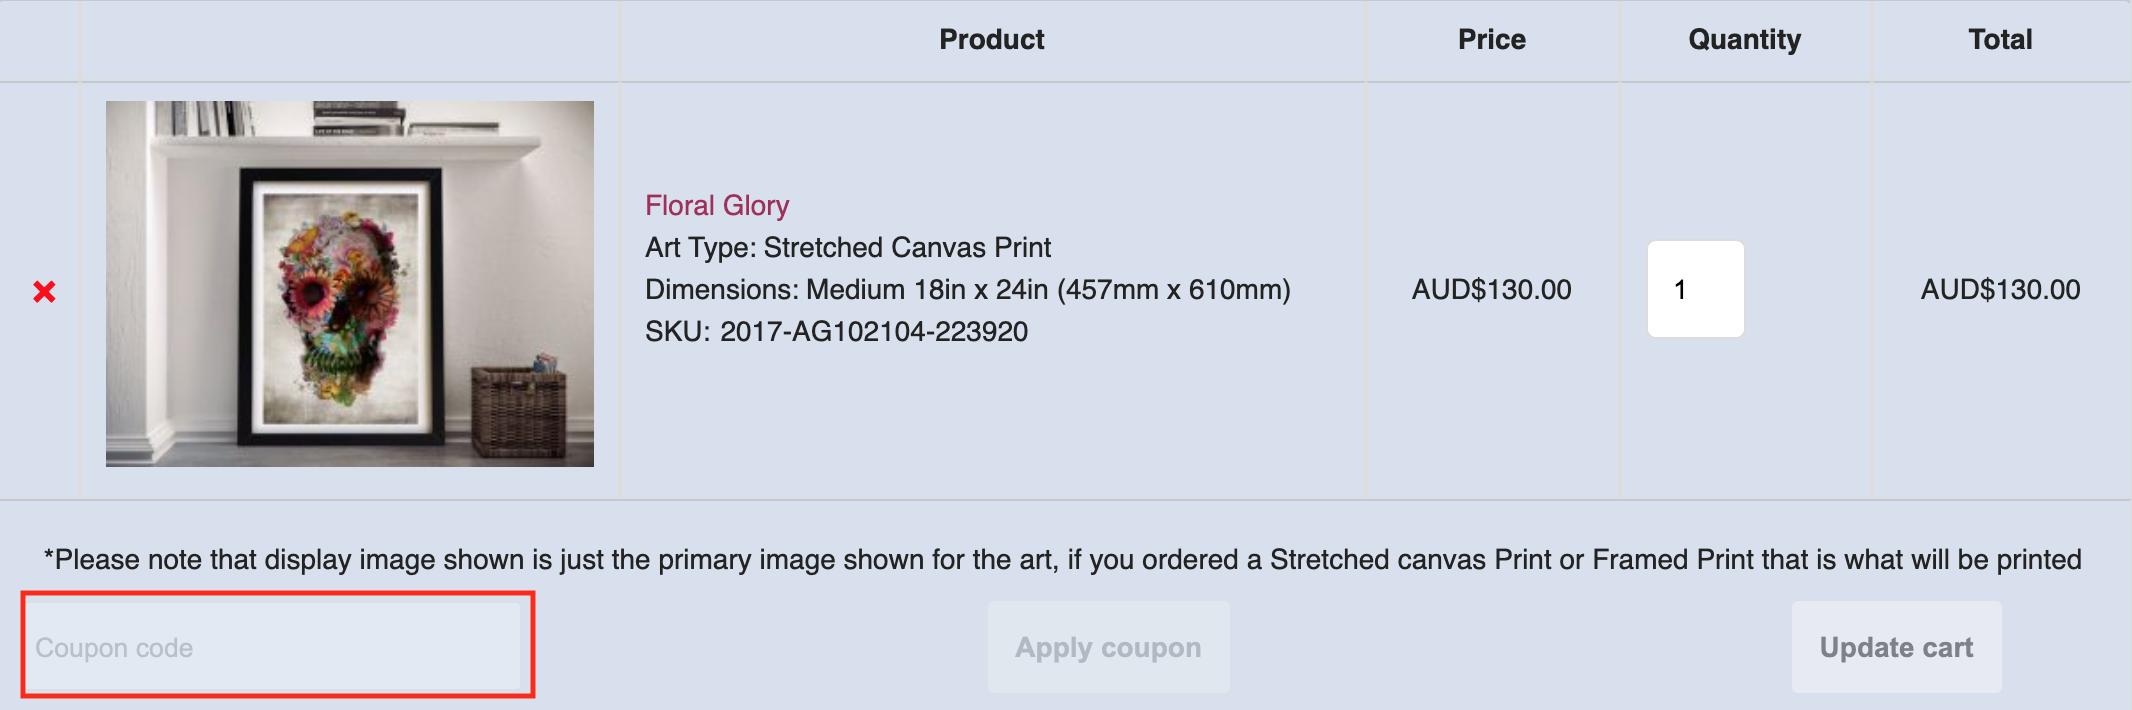 blue horizon prints coupon code